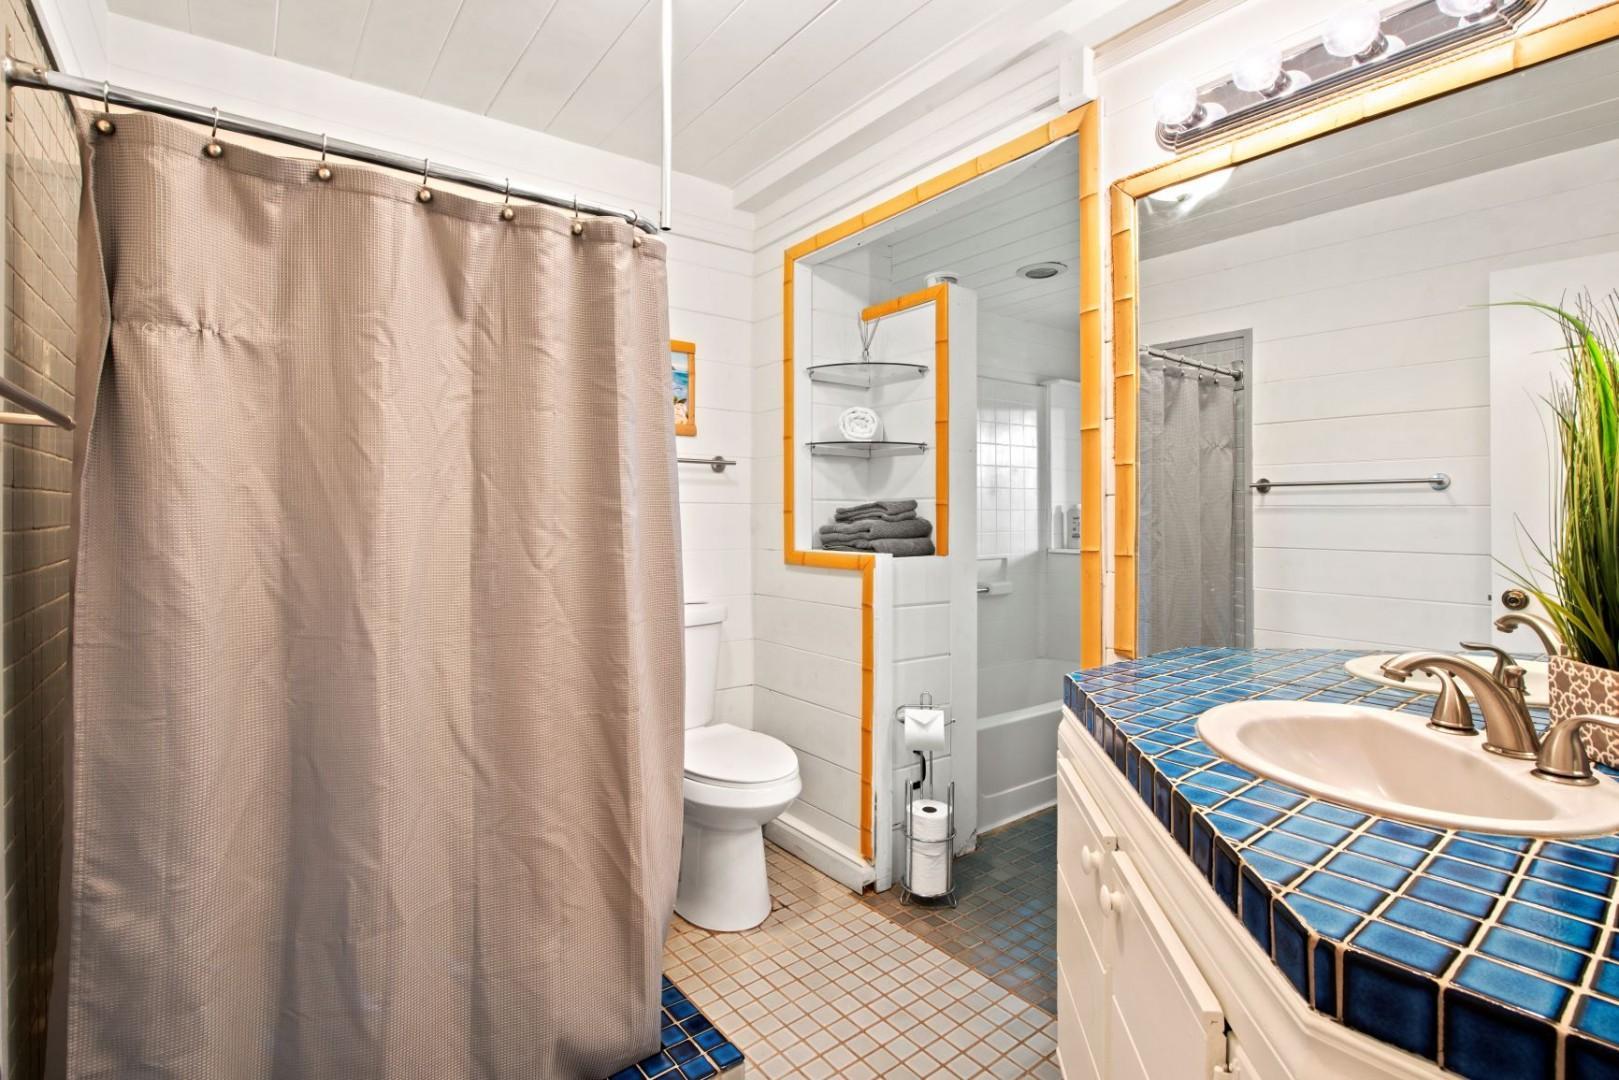 11 downstairs bathroom